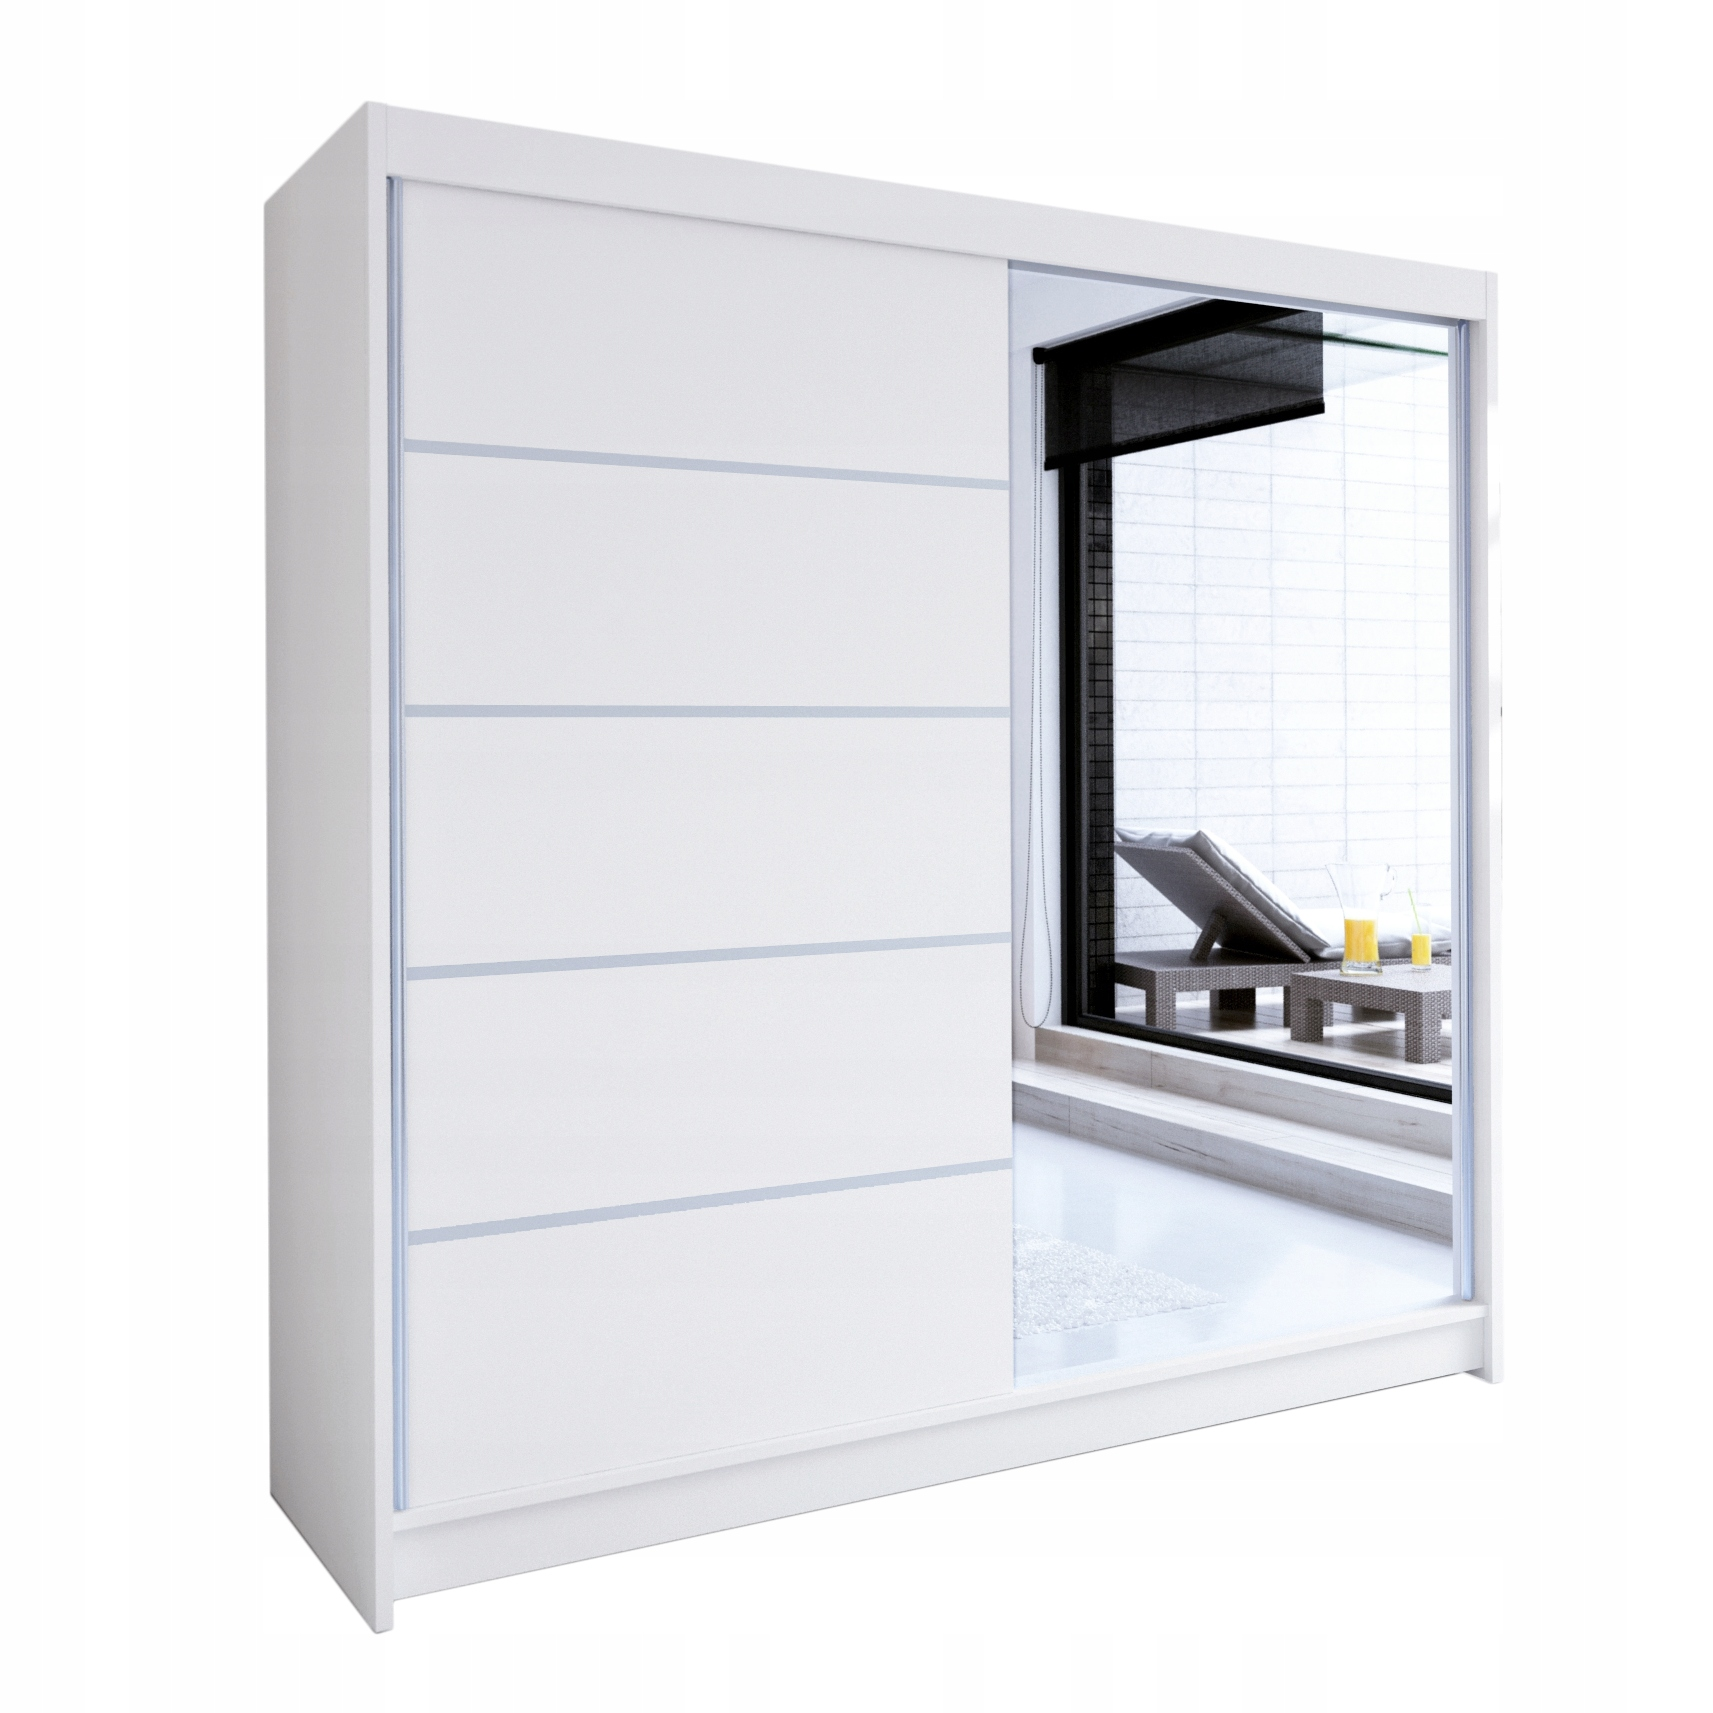 ГАРДЕРОБ с раздвижными дверями TALIN III 180 зеркало